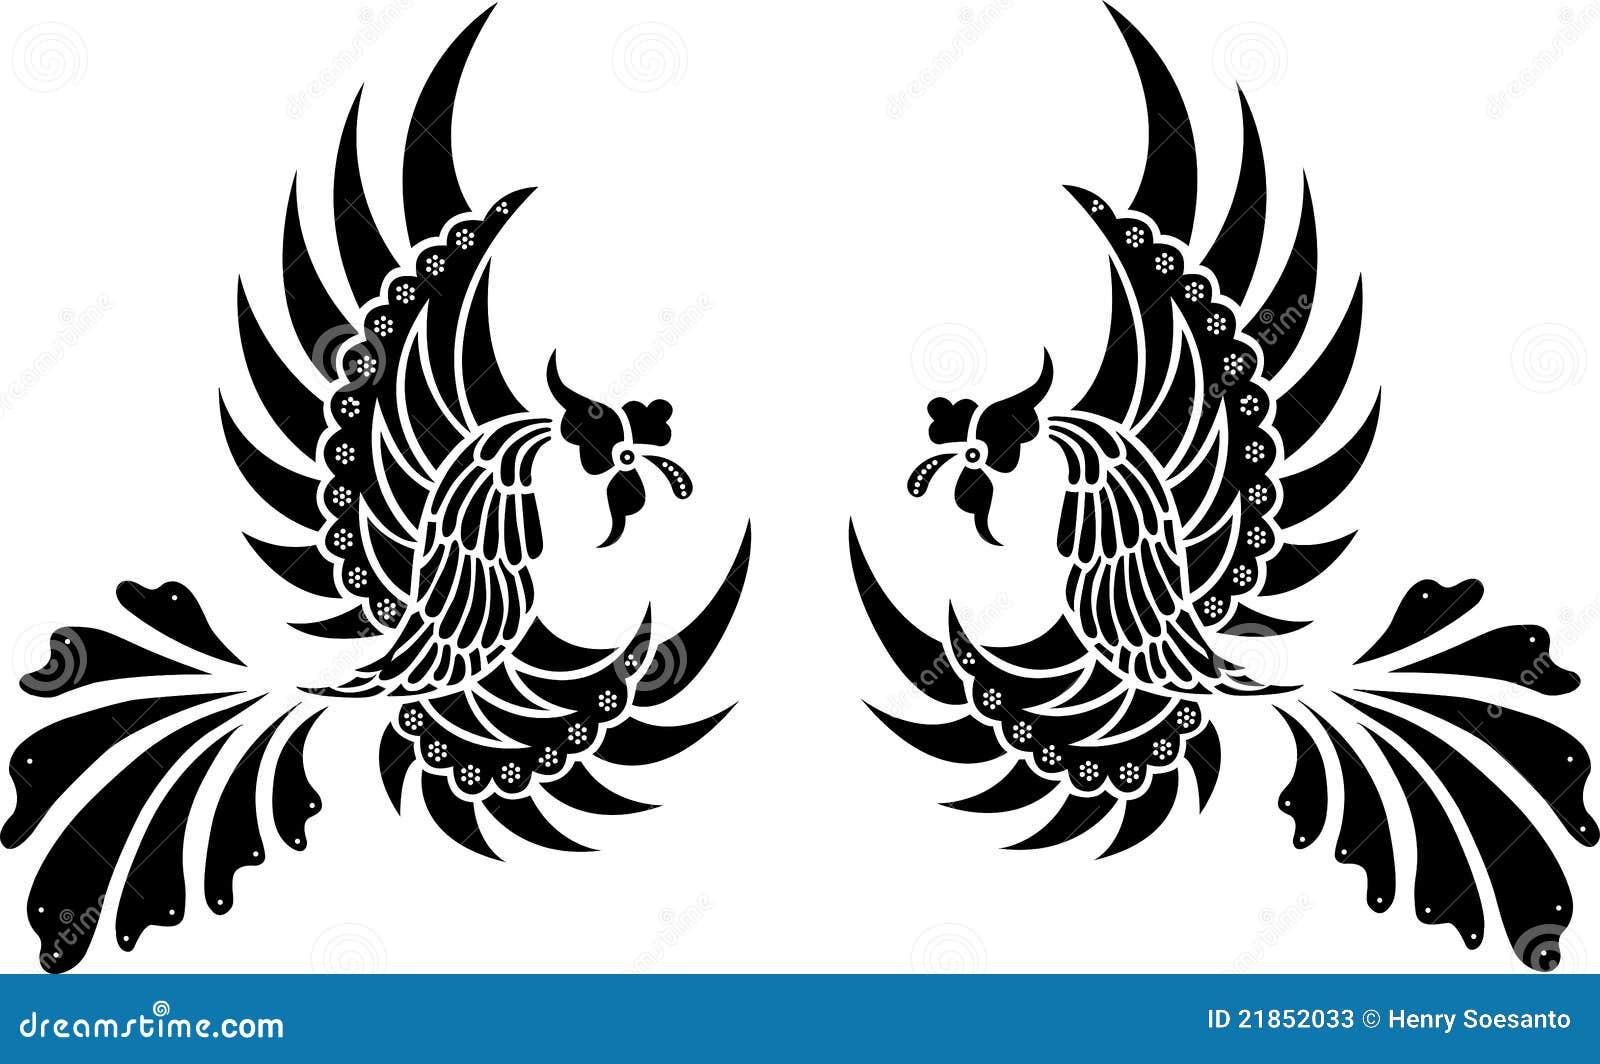 16 tattoo design program free download tattoos tribals gems stock photo image 33575860. Black Bedroom Furniture Sets. Home Design Ideas